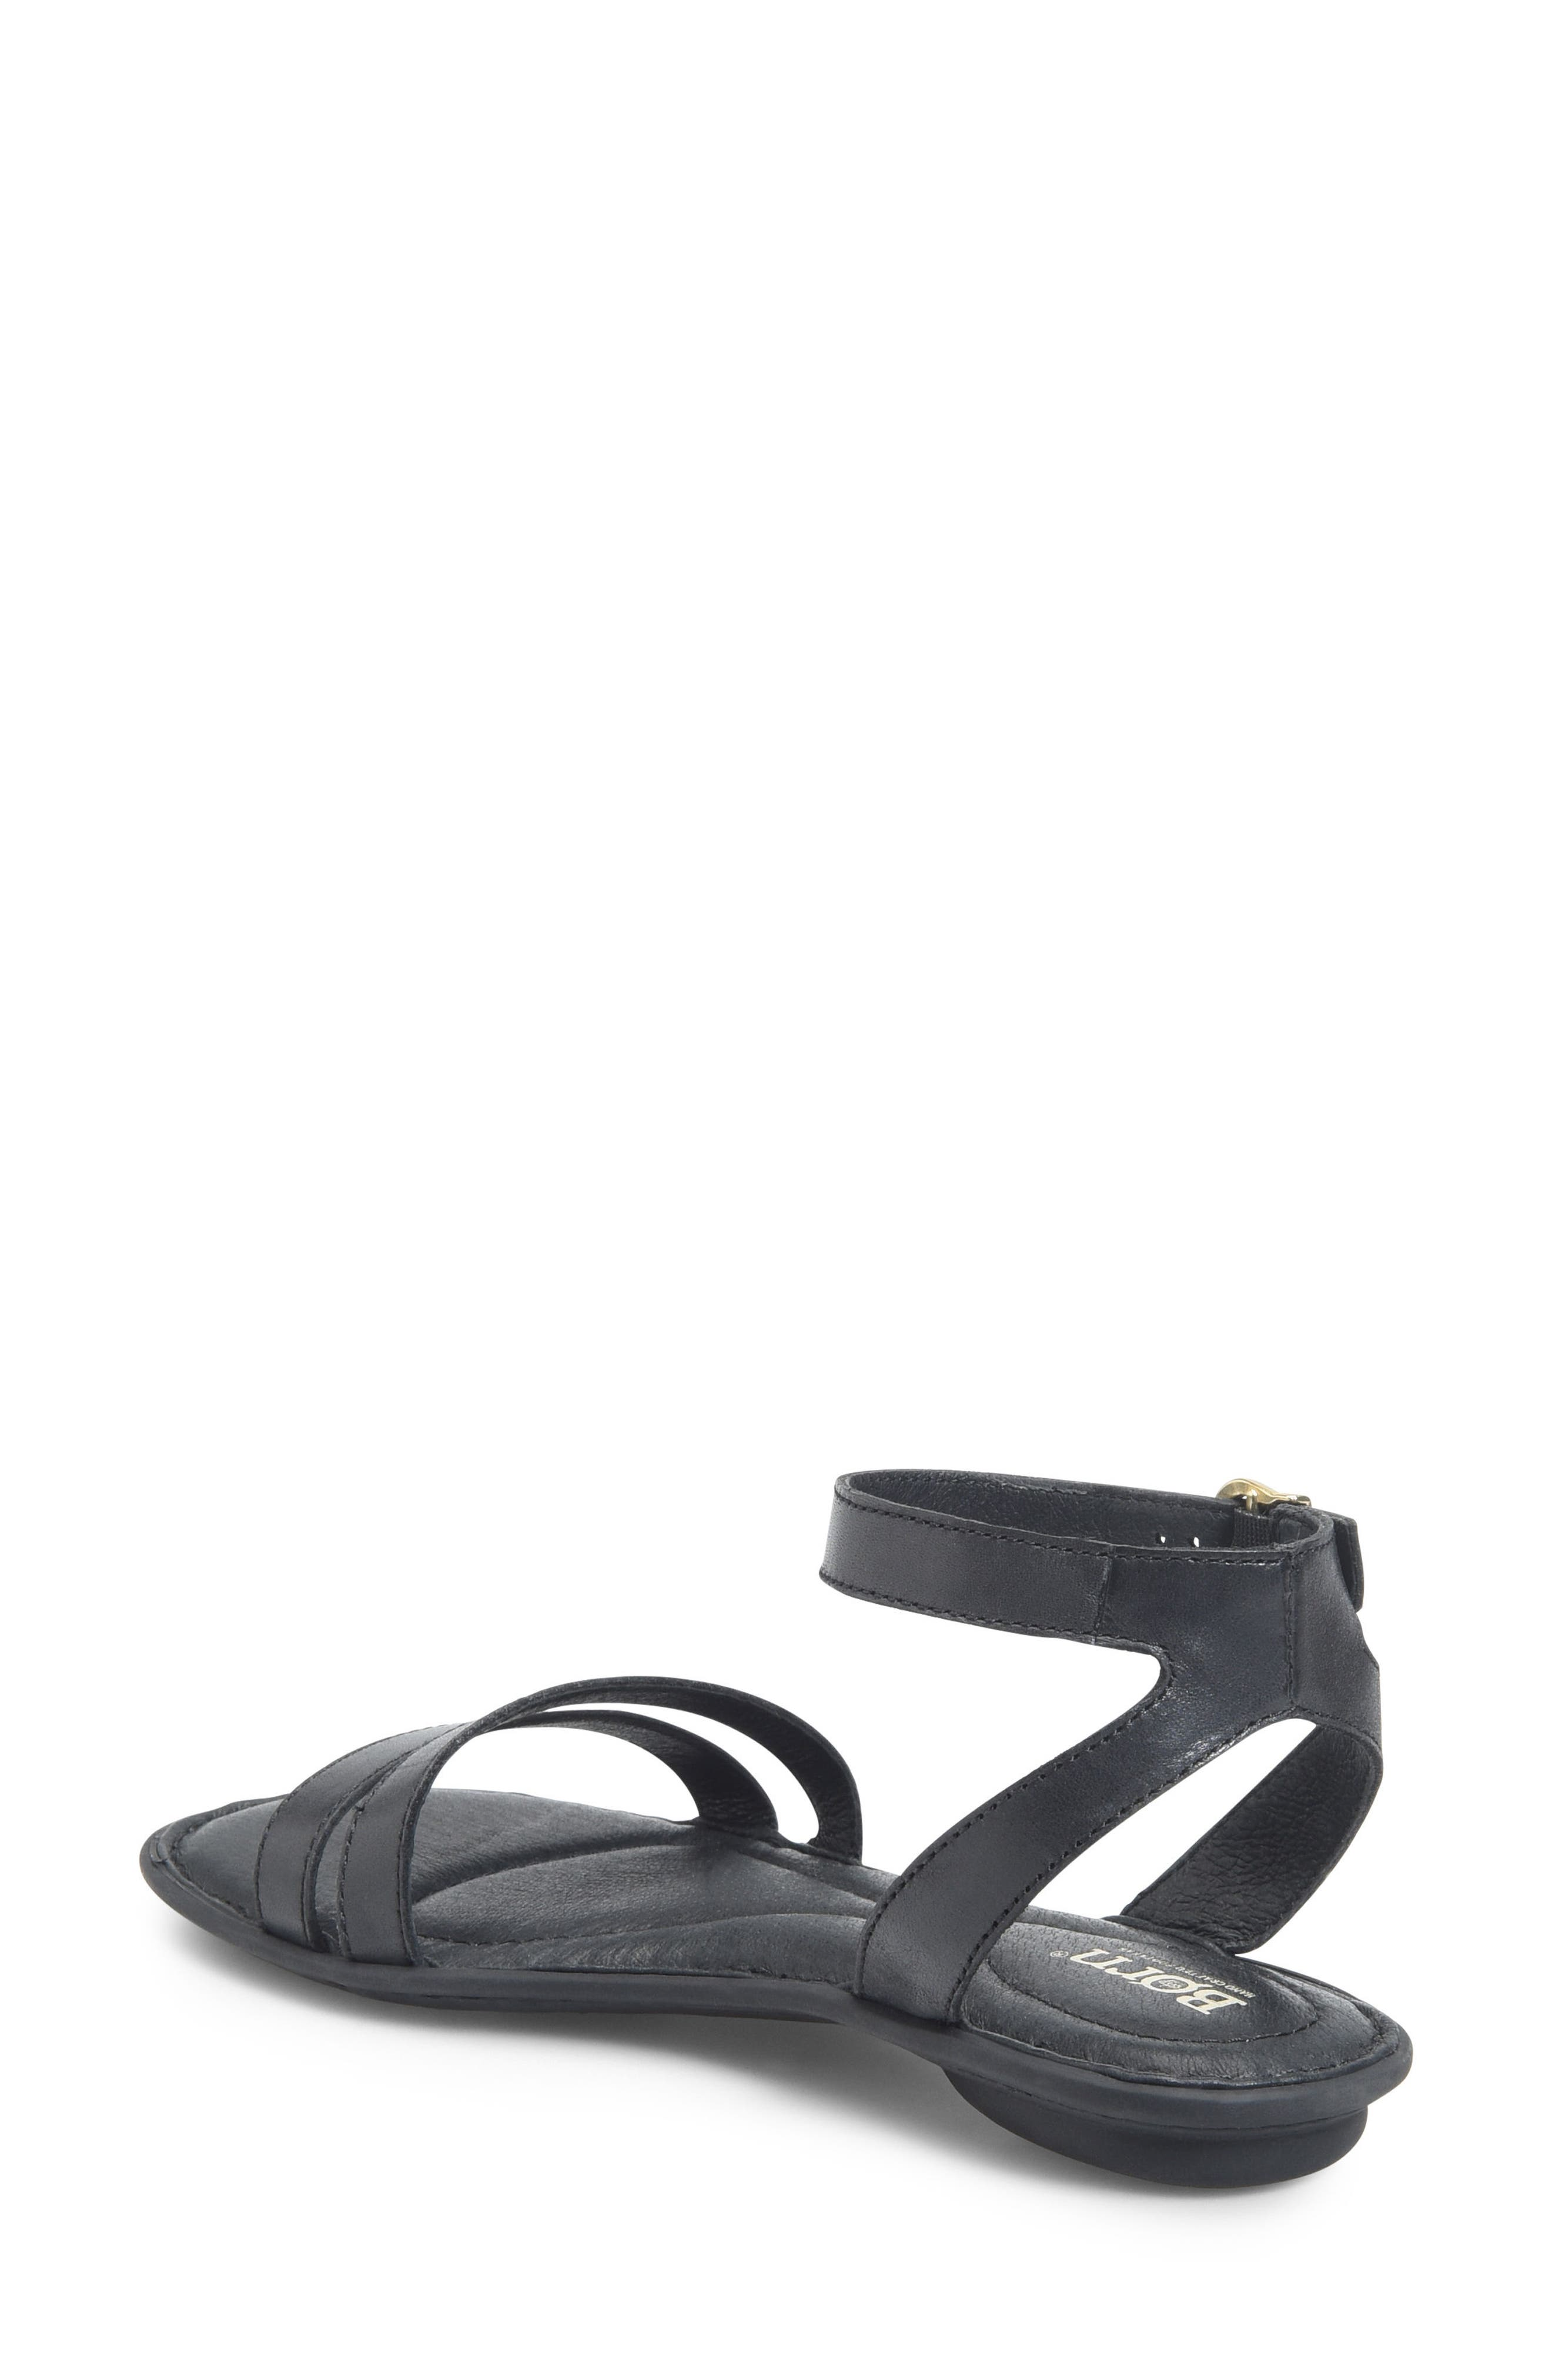 Mai Easy Sandal,                             Alternate thumbnail 2, color,                             Black Leather